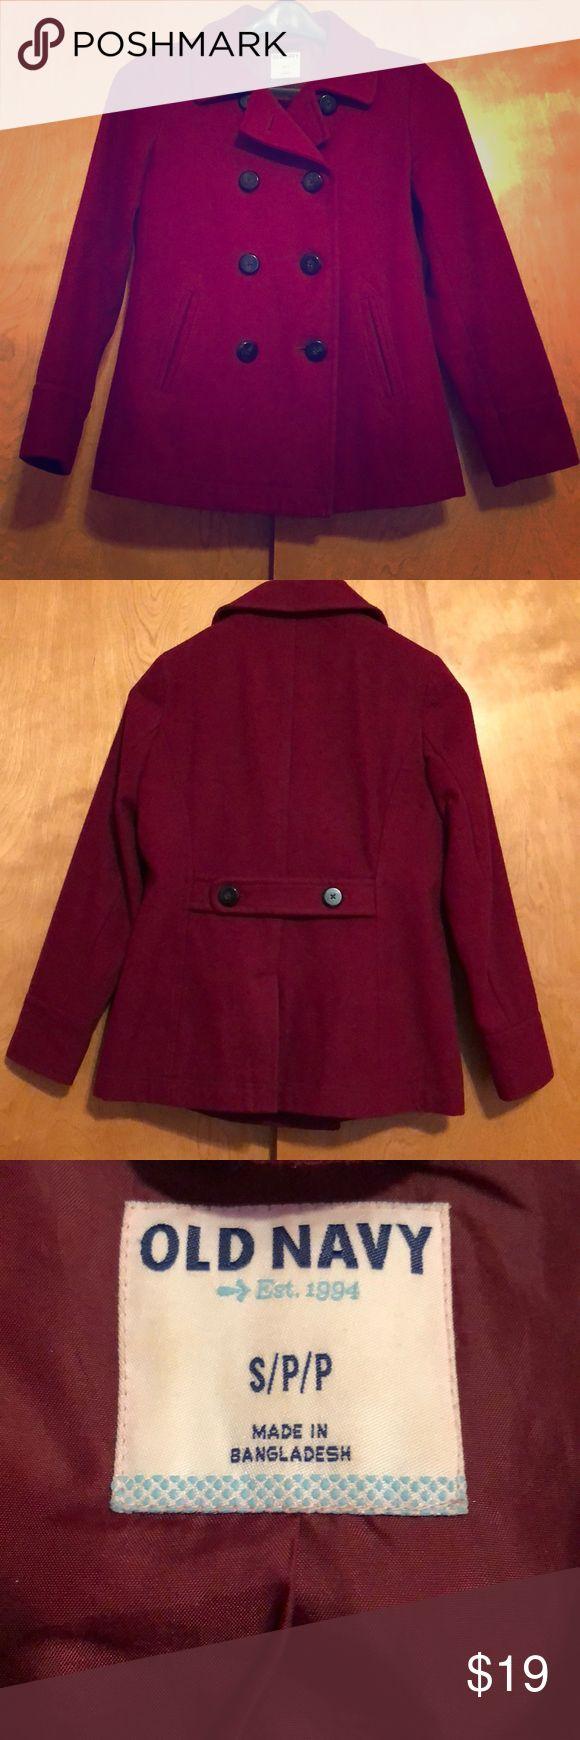 Old Navy Pea Coat Classic pea coat. Deep maroon color. Old Navy Jackets & Coats Pea Coats